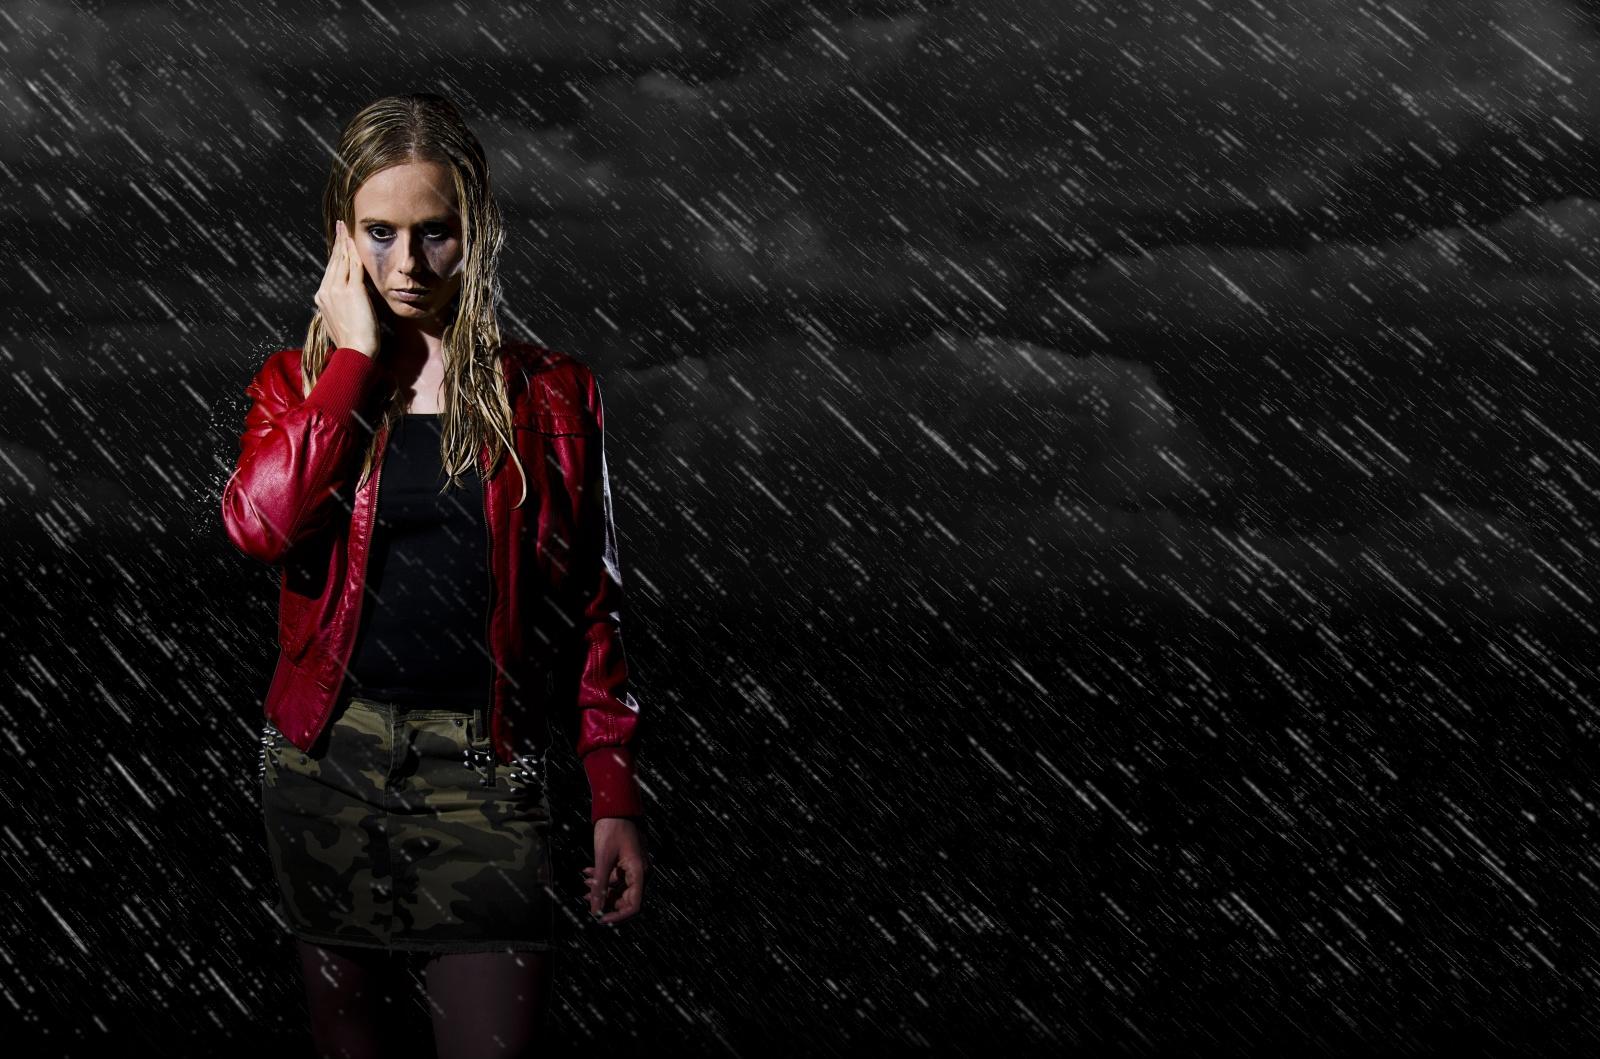 woman walking in the rain horizontal